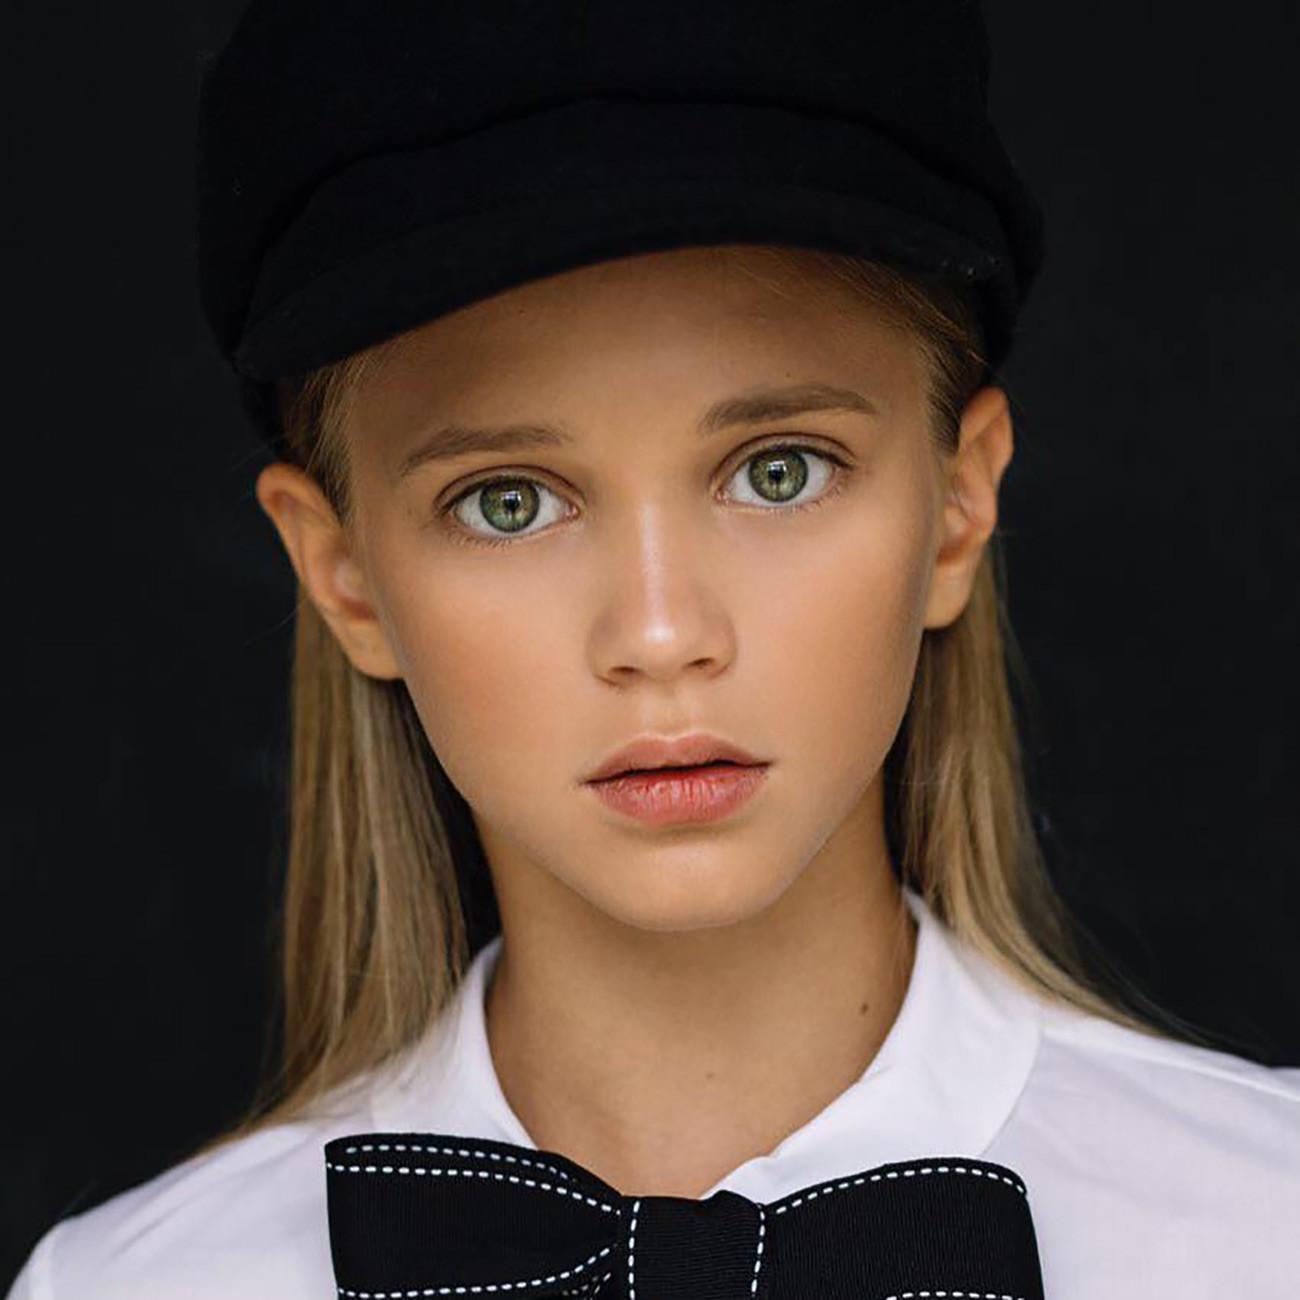 Russian Blonde Teen Webcam